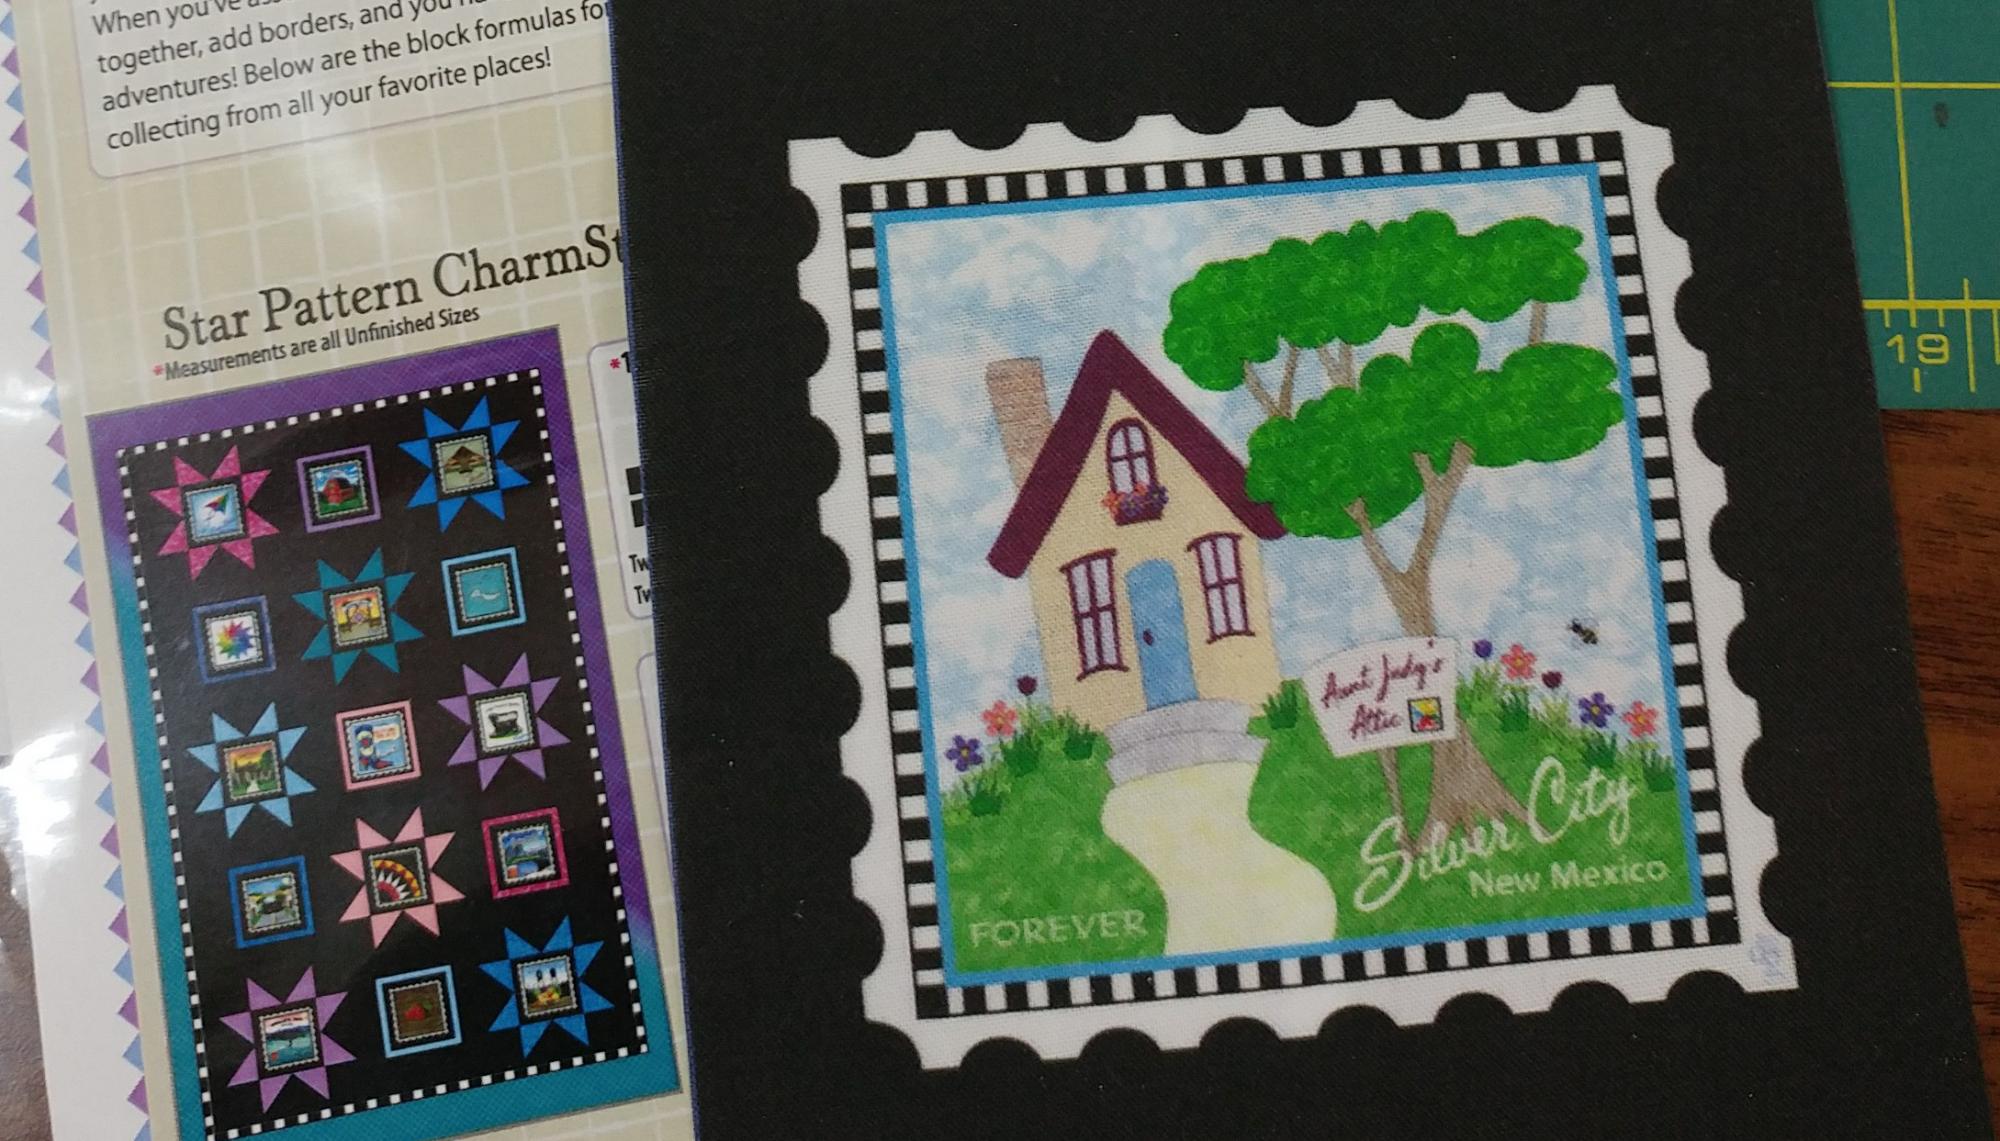 Charm Stamp Attic